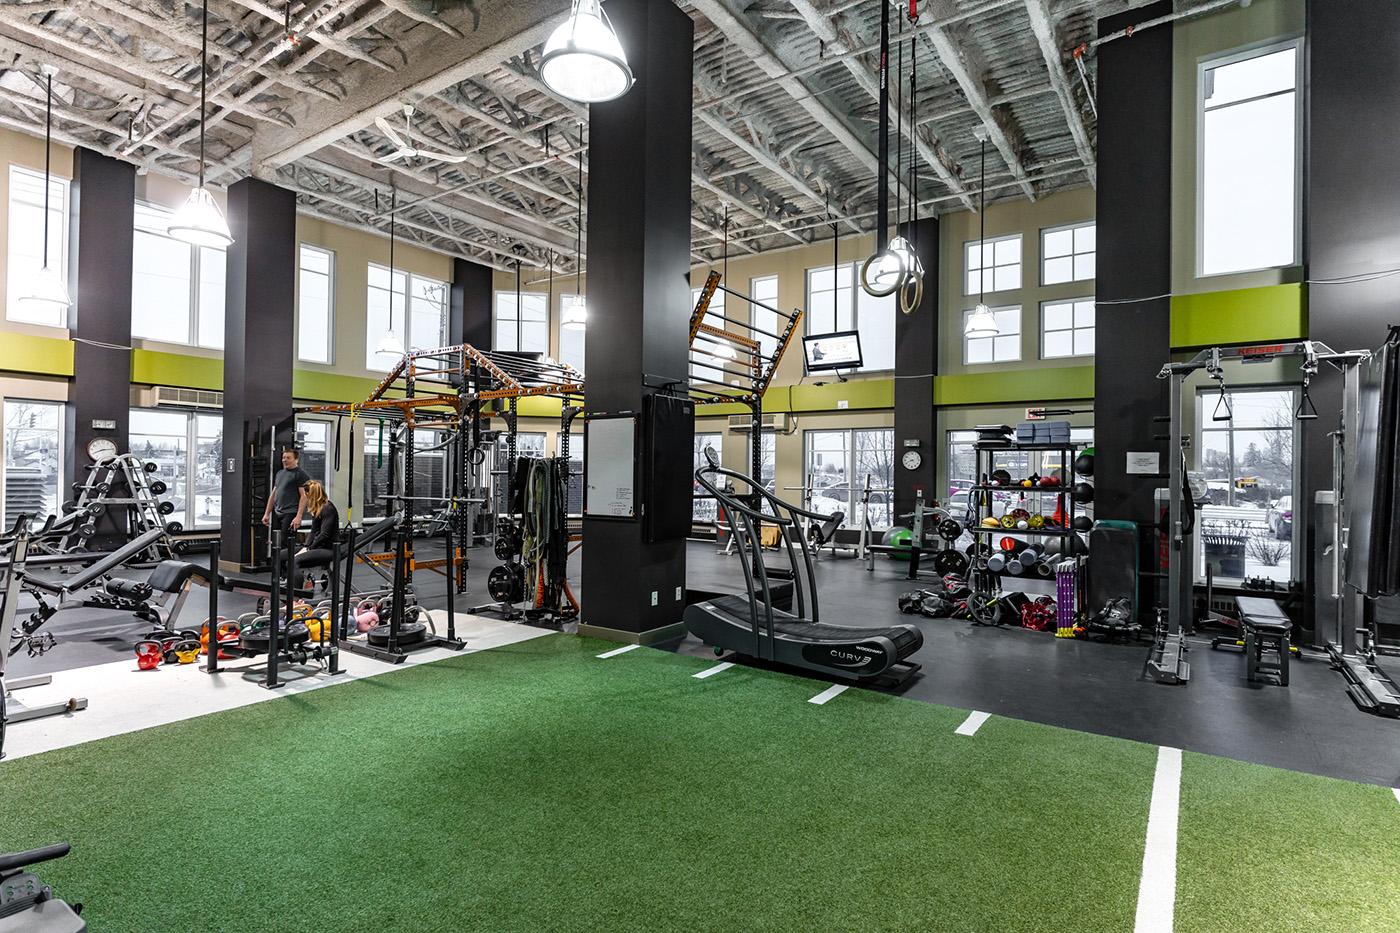 cityfit-gym-personal-training-calgary-workout-facility-inglewood-10.jpg